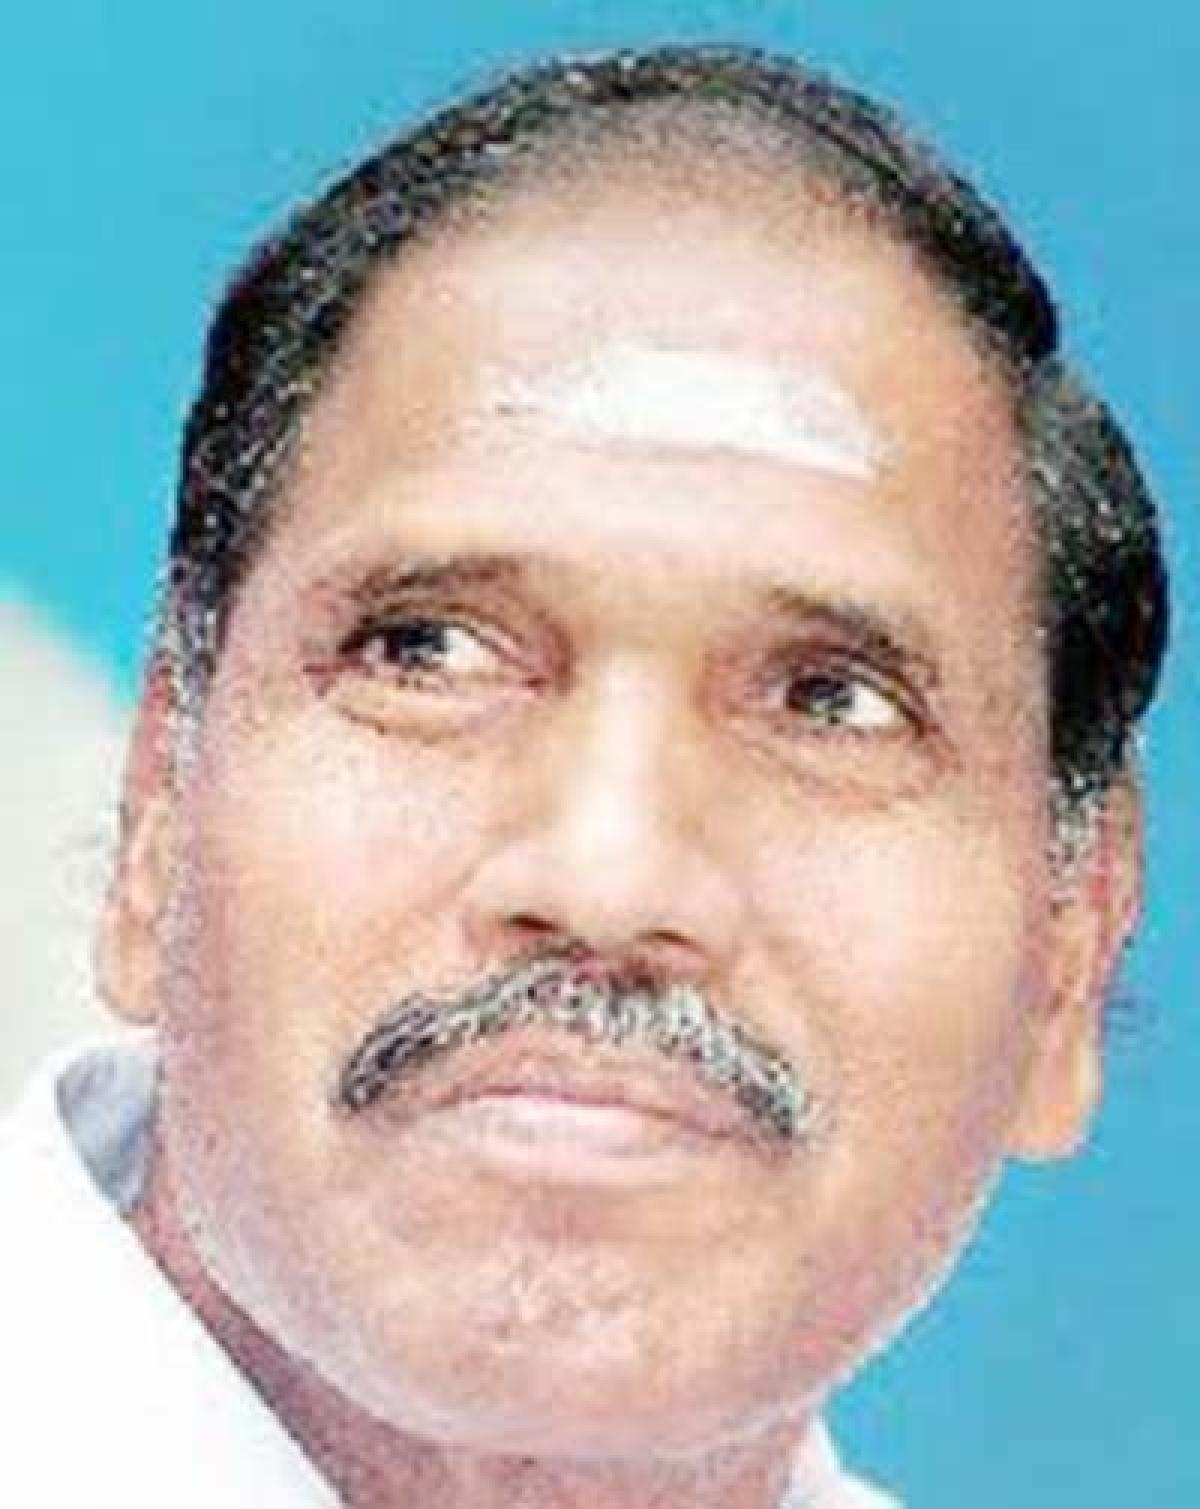 DMK attacks Pondy CM over lathicharge